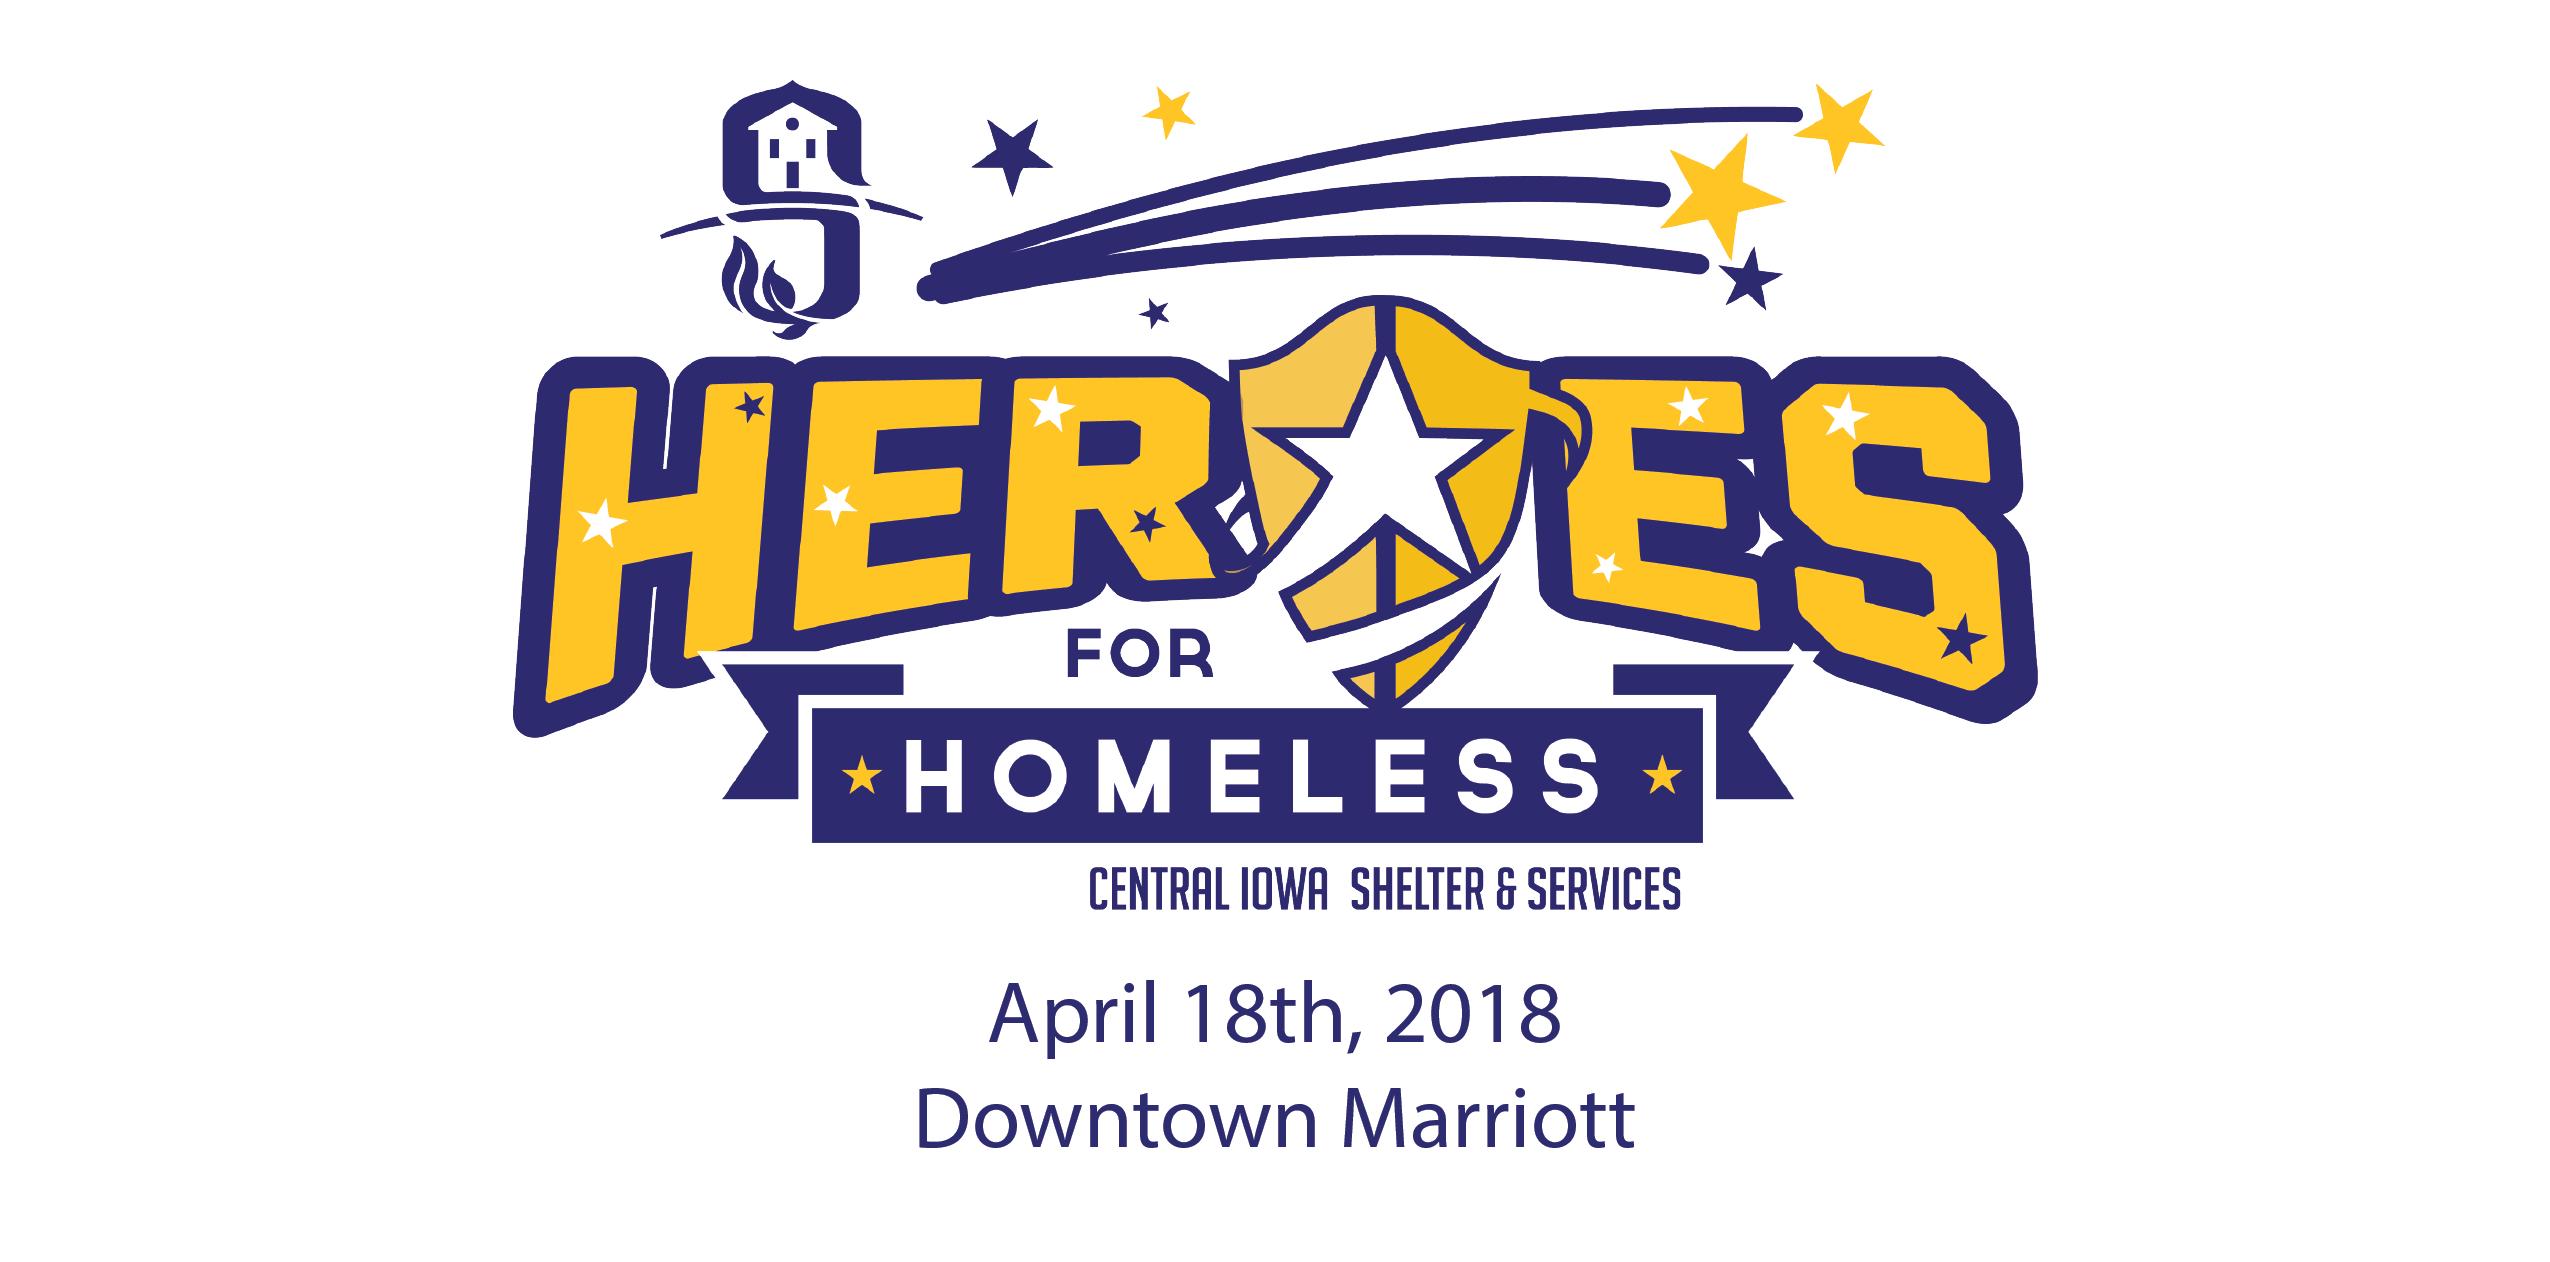 Heroes For Homeless